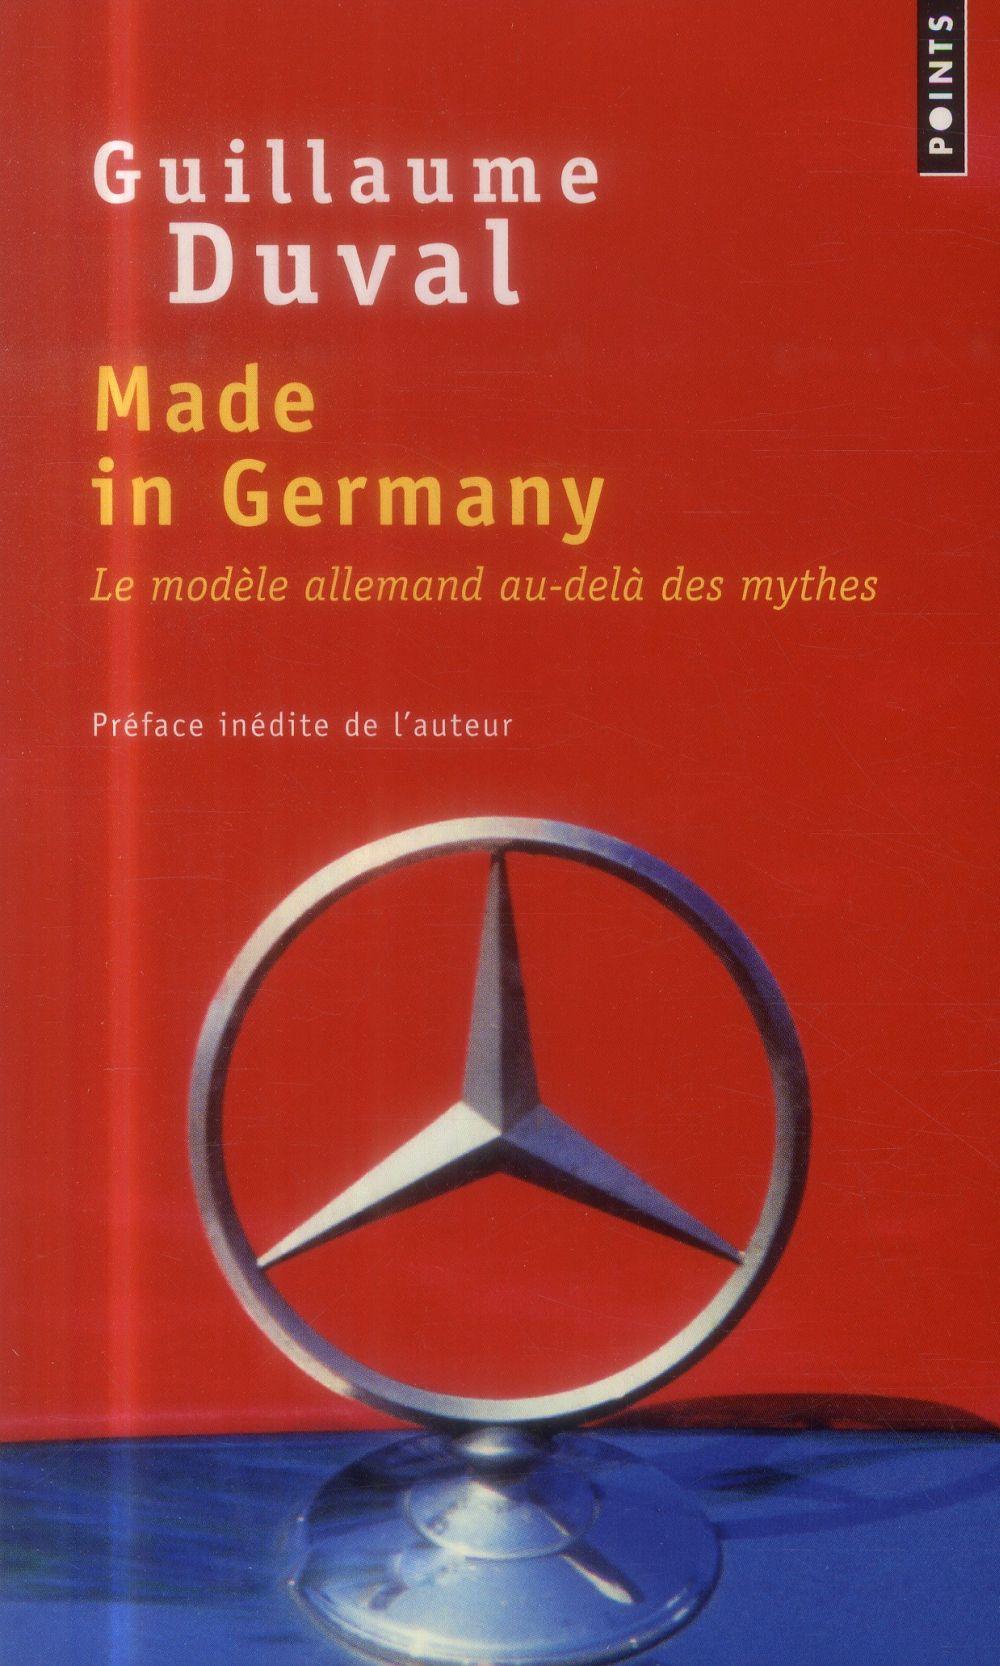 Made In Germany ; Le Modele Allemand Au-Dela Des Mythes